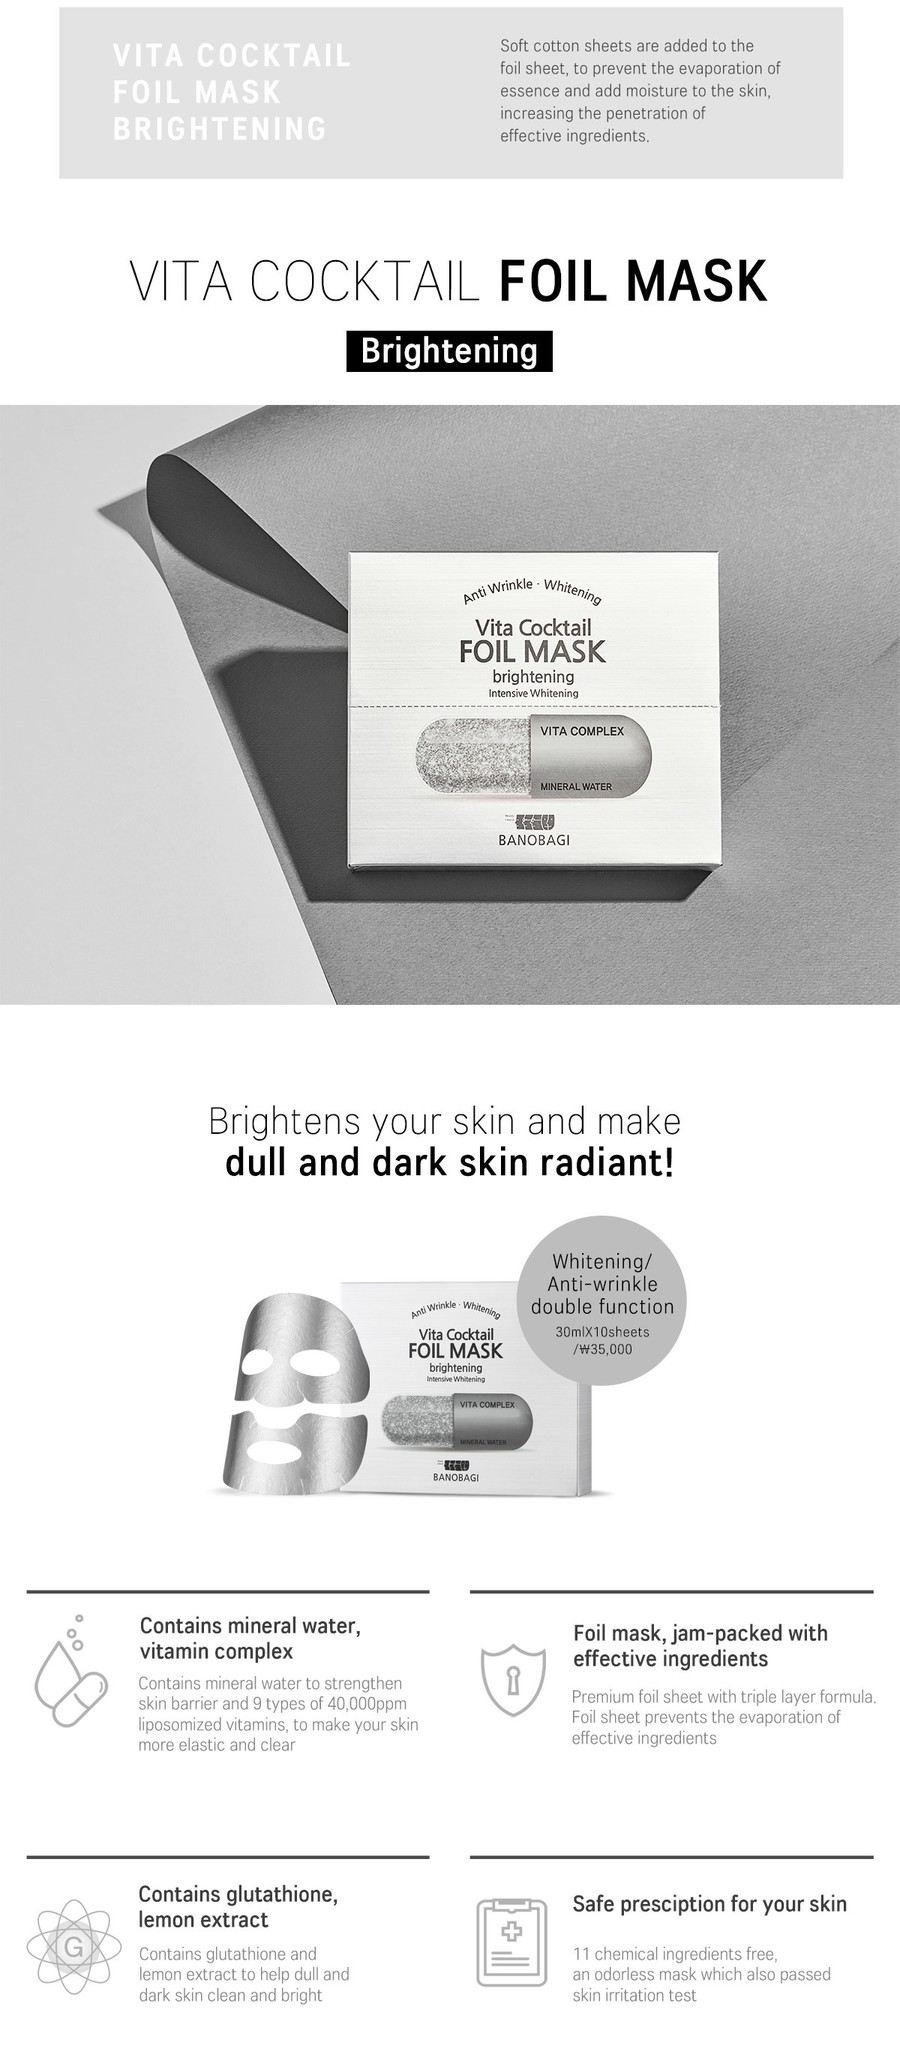 Vita Cocktail Foil Mask Brightening-2